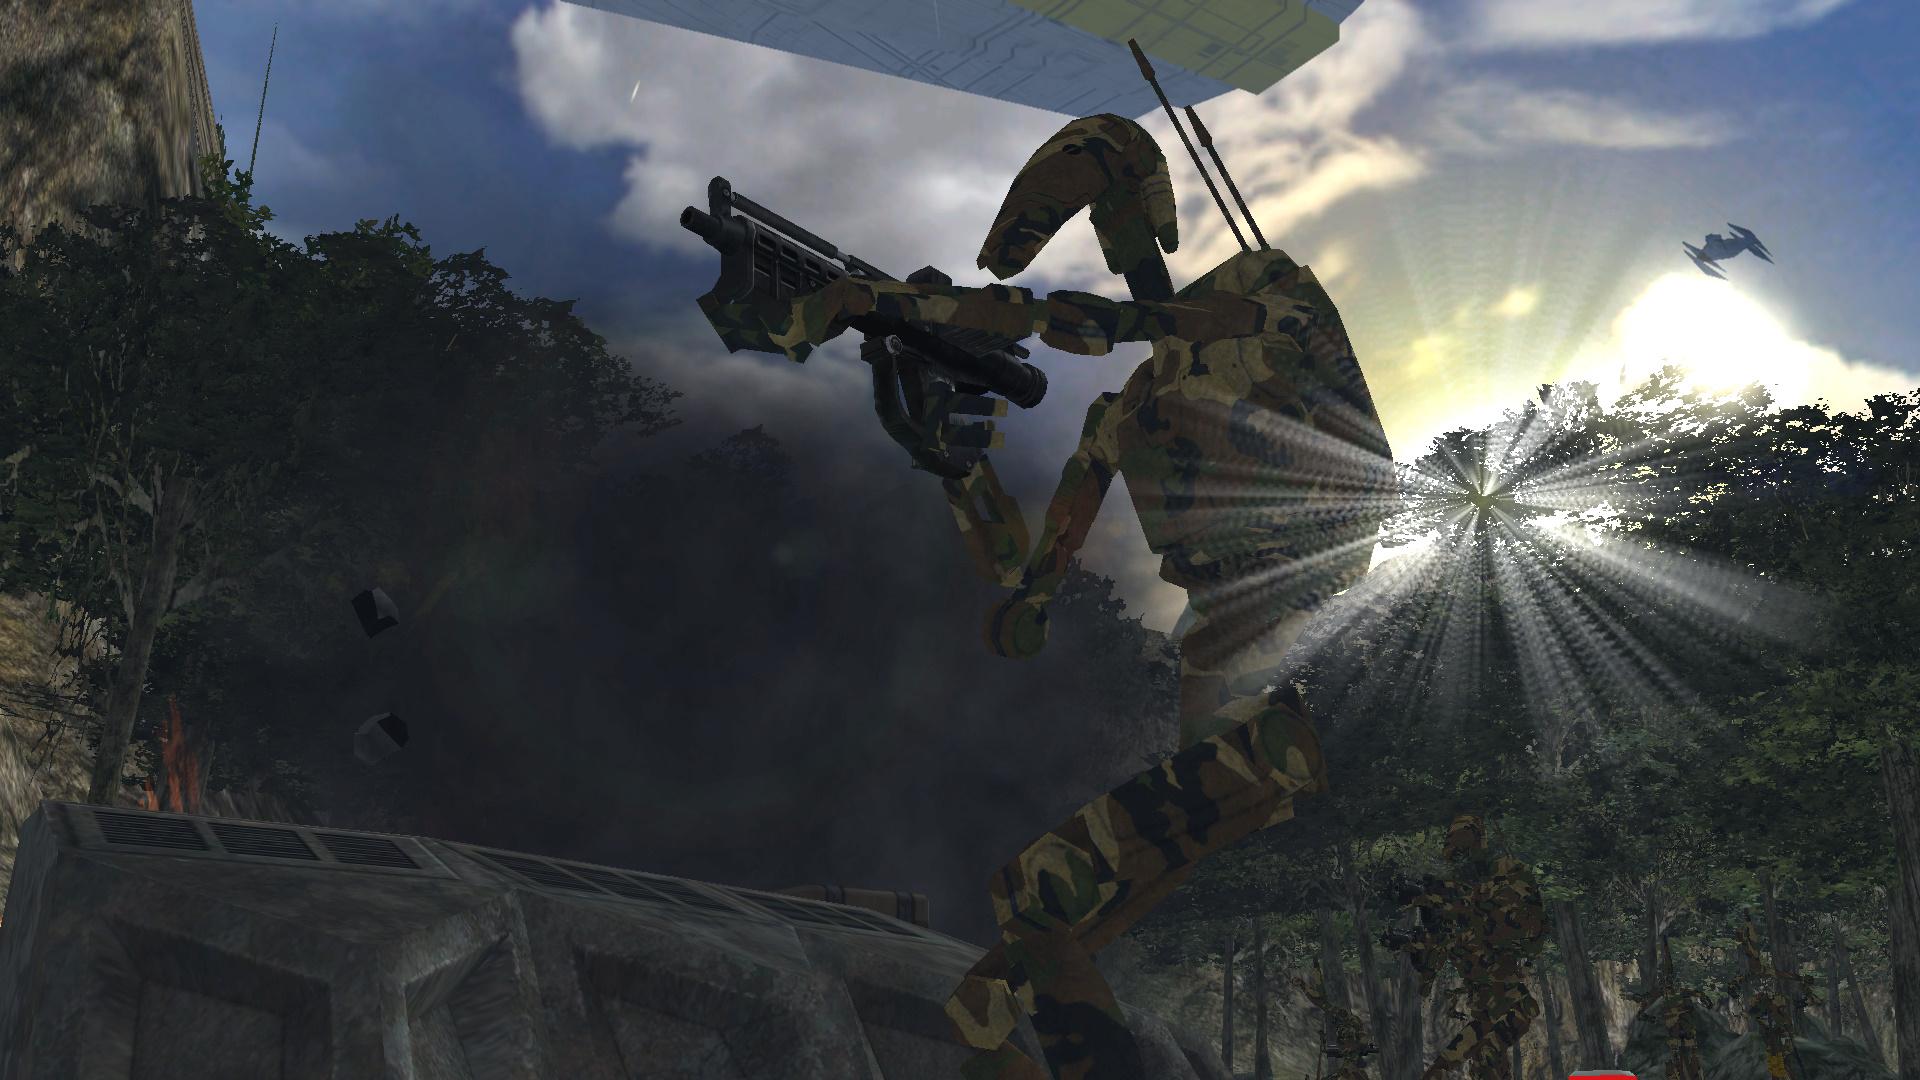 Yvr 30 7 17 Update News Yavin Valley Of Ruins Mod For Star Wars Battlefront Ii Mod Db